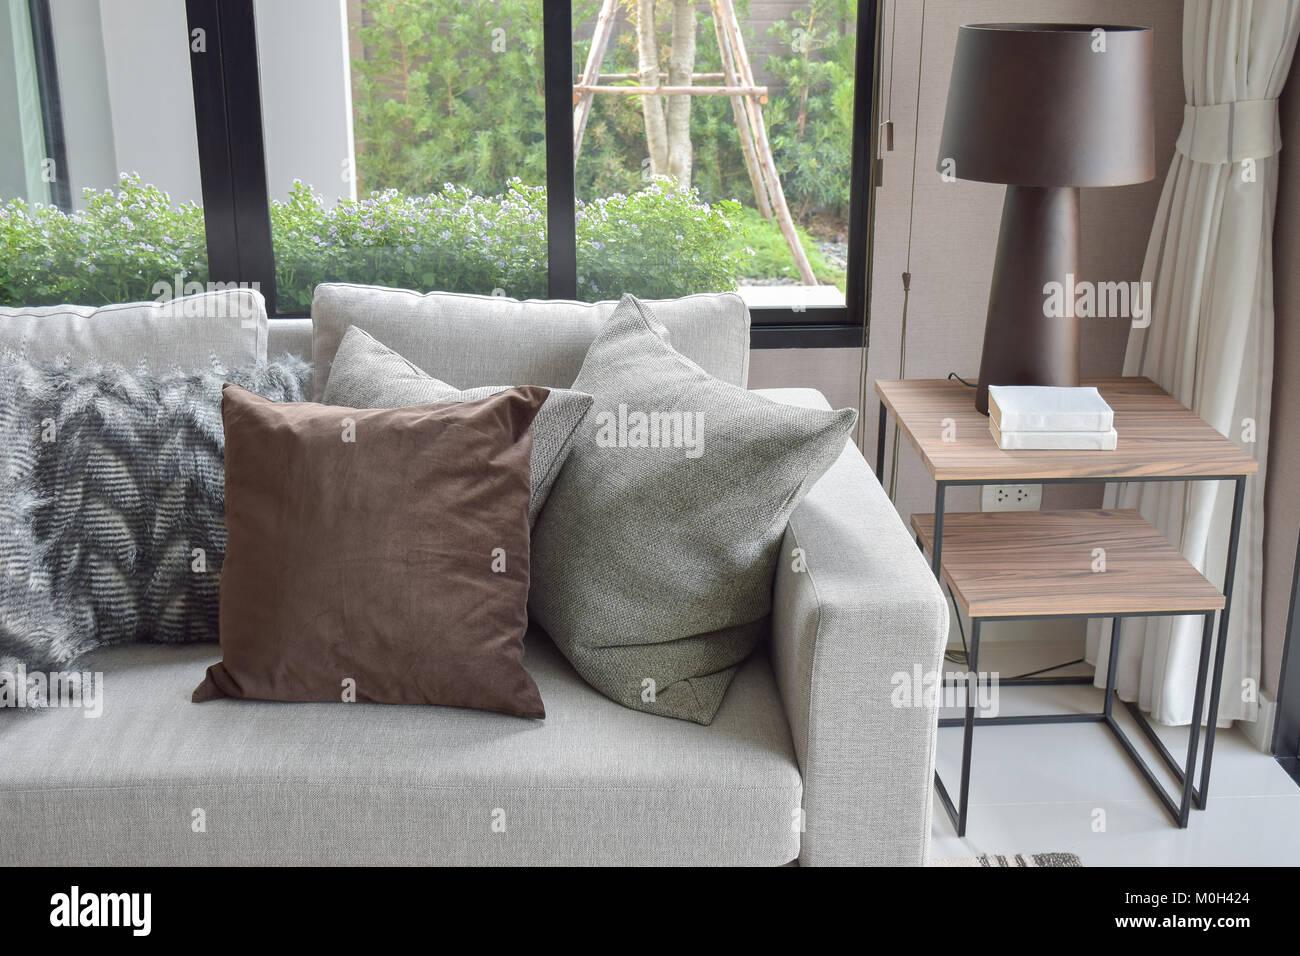 Ambient Light Living Room Stockfotos & Ambient Light Living Room ...